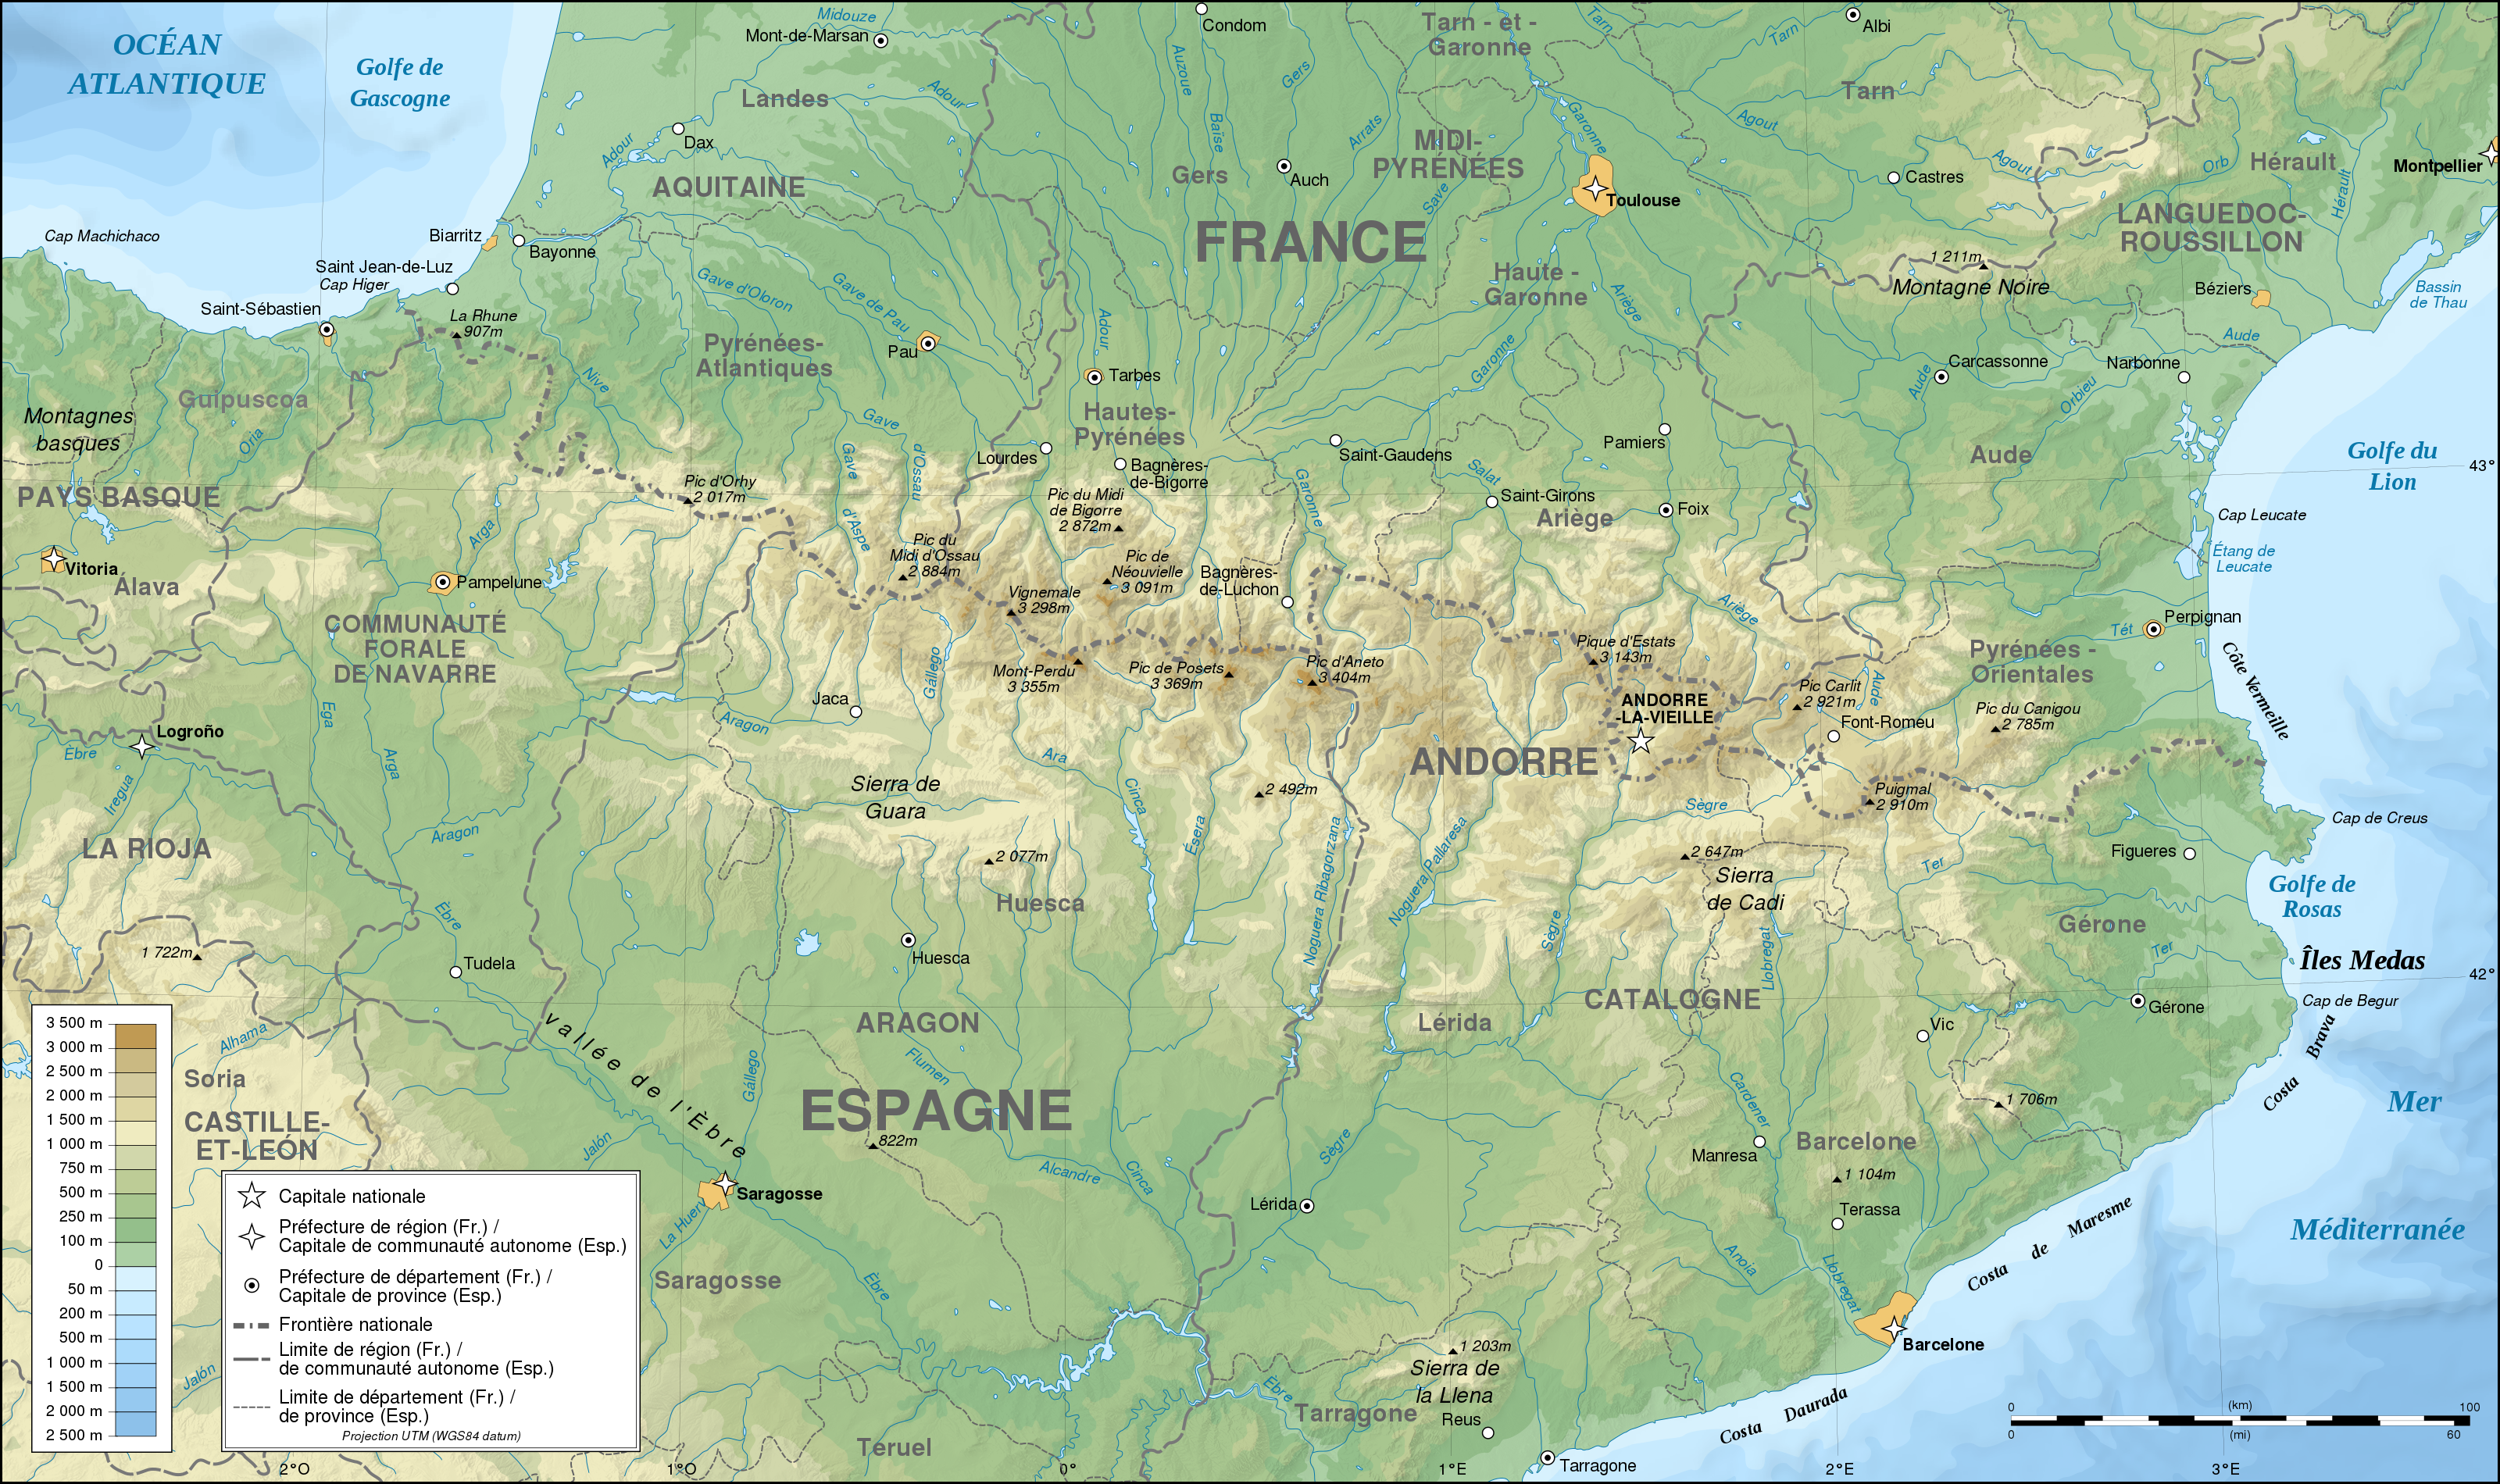 Carte Espagne Topographique.France Espagne Pyrenees Topographique Carte